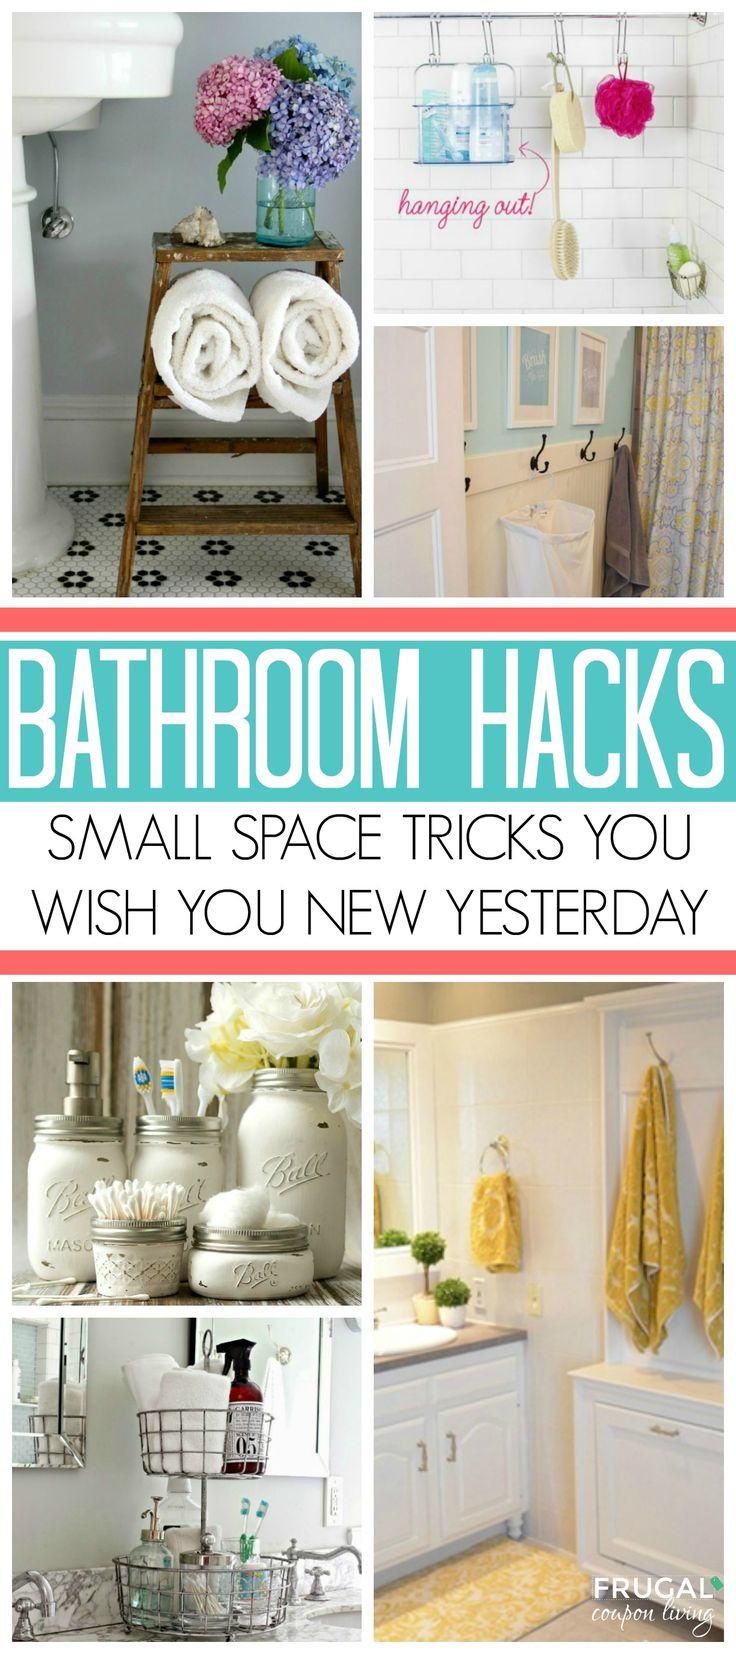 bathroom storage solutions small space hacks tricks magnets space hack and bathroom hacks. Black Bedroom Furniture Sets. Home Design Ideas